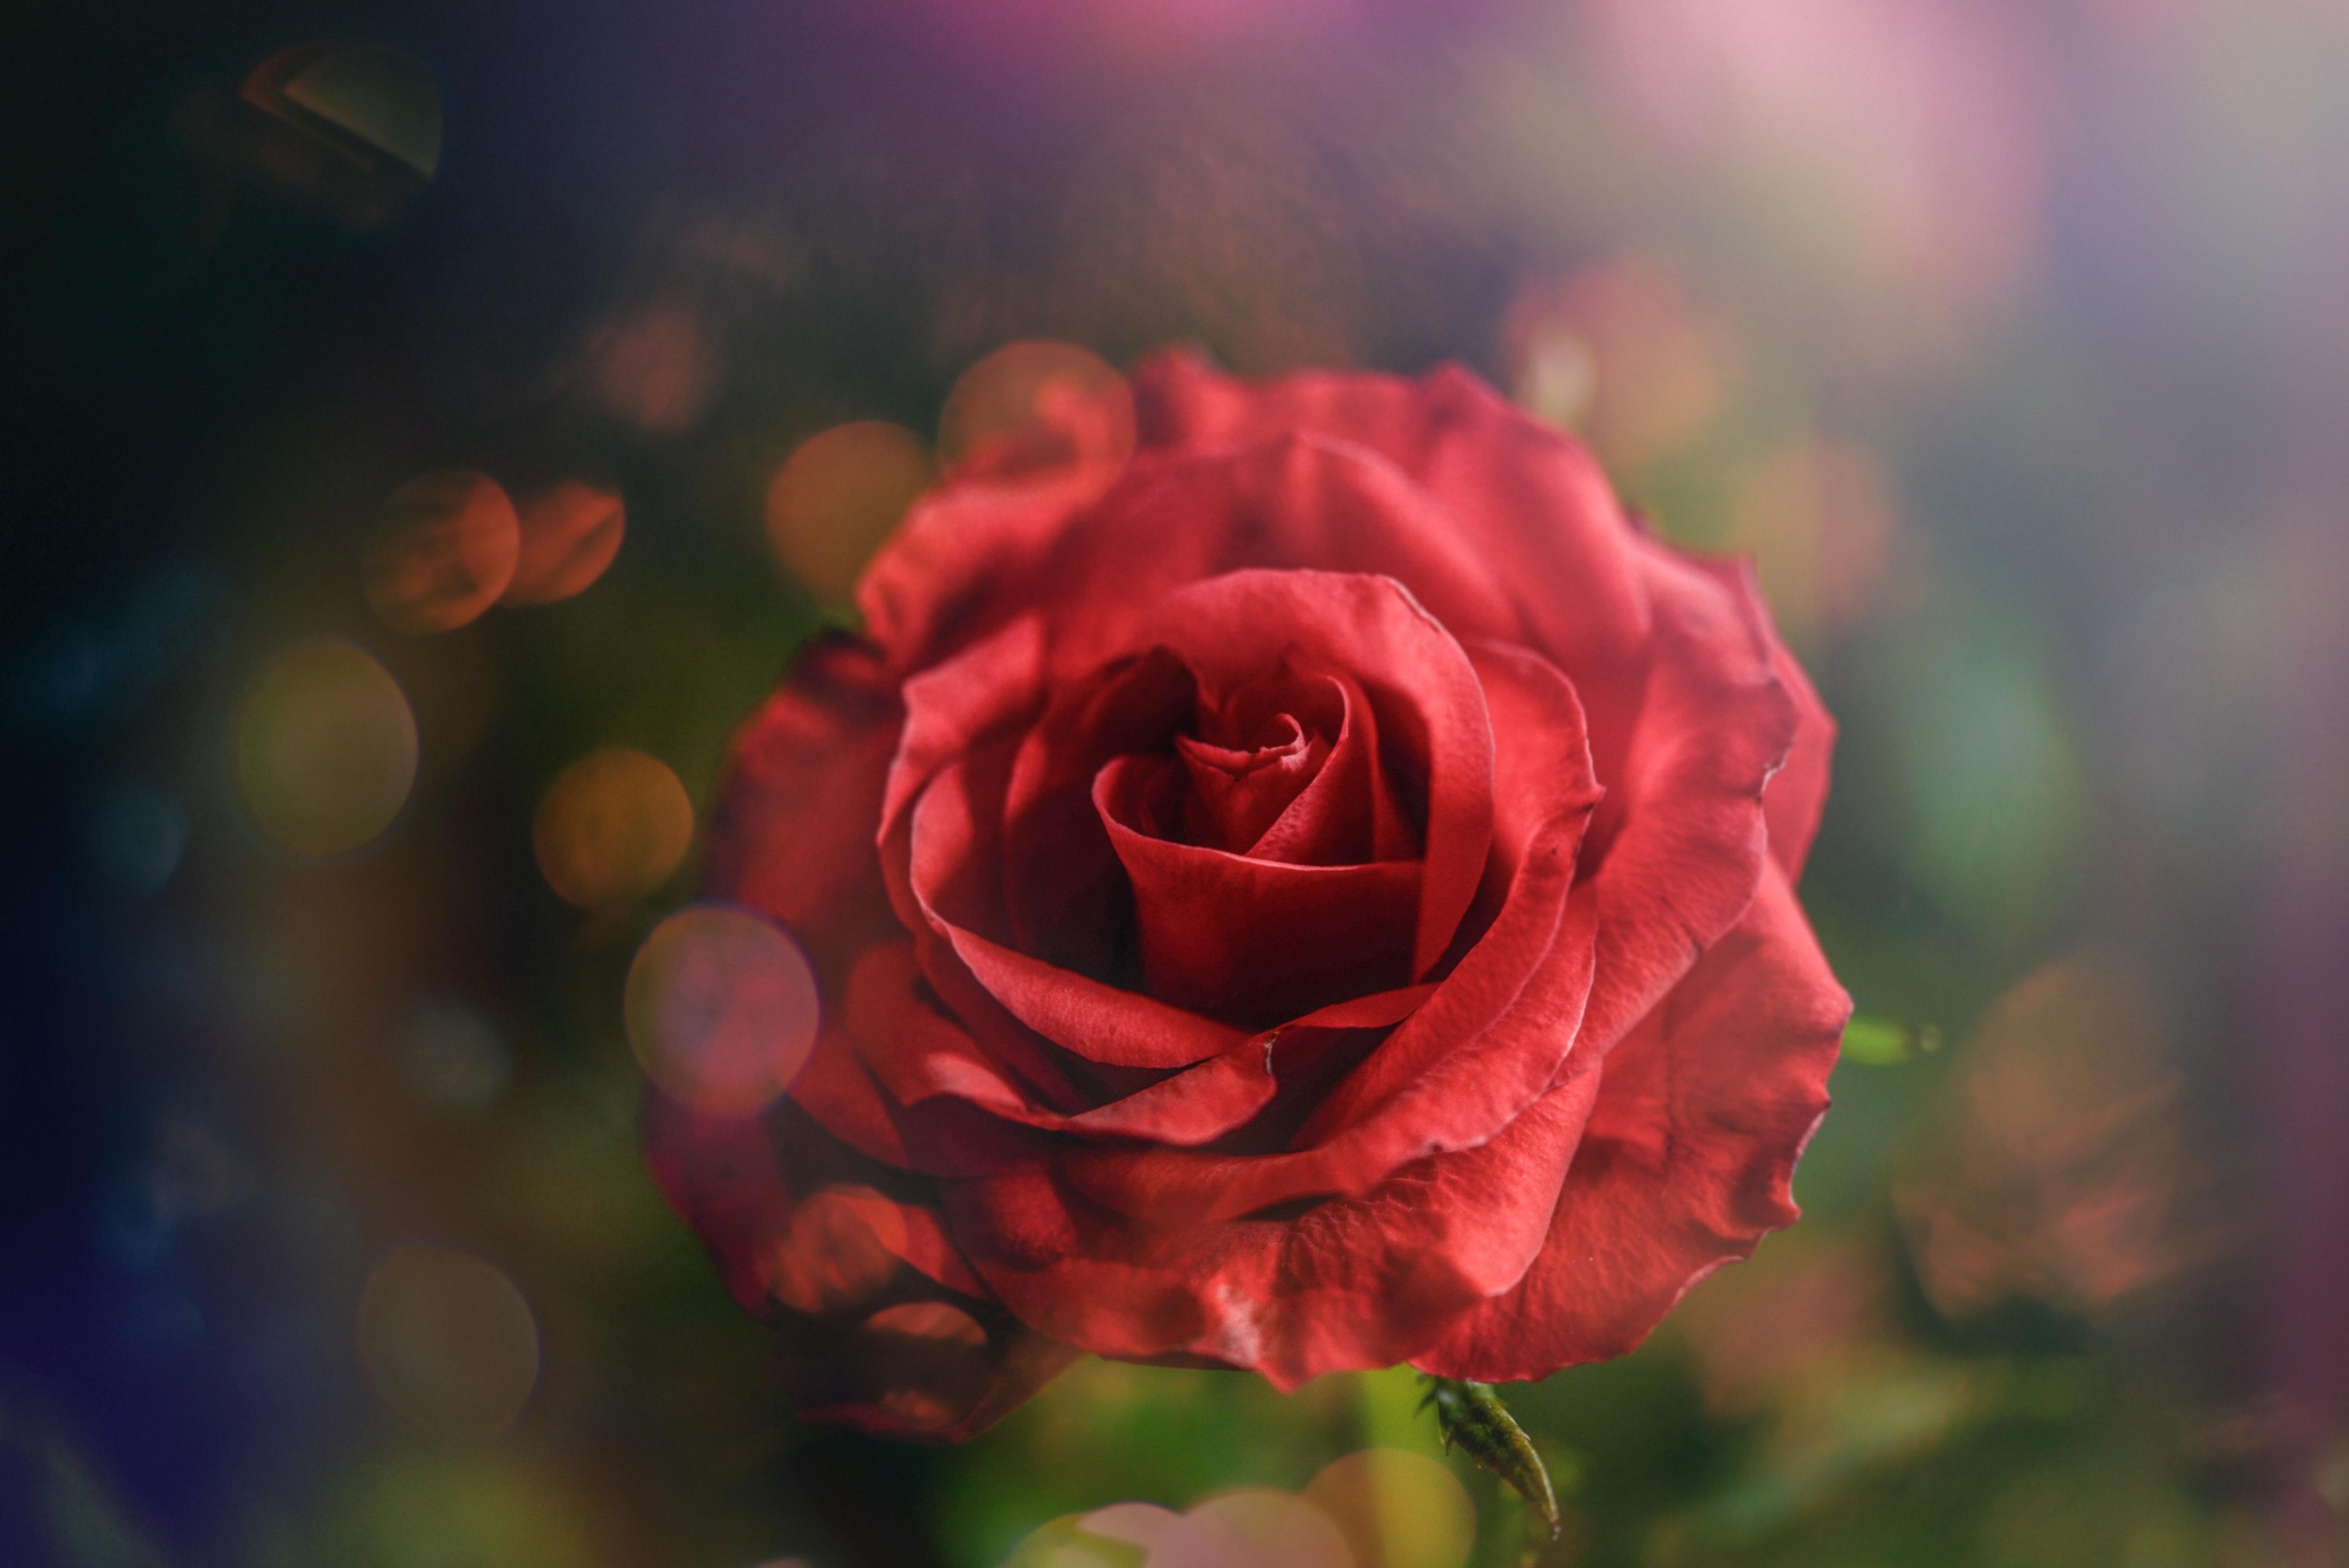 1000 Amazing Red Rose Photos Pexels Free Stock Photos